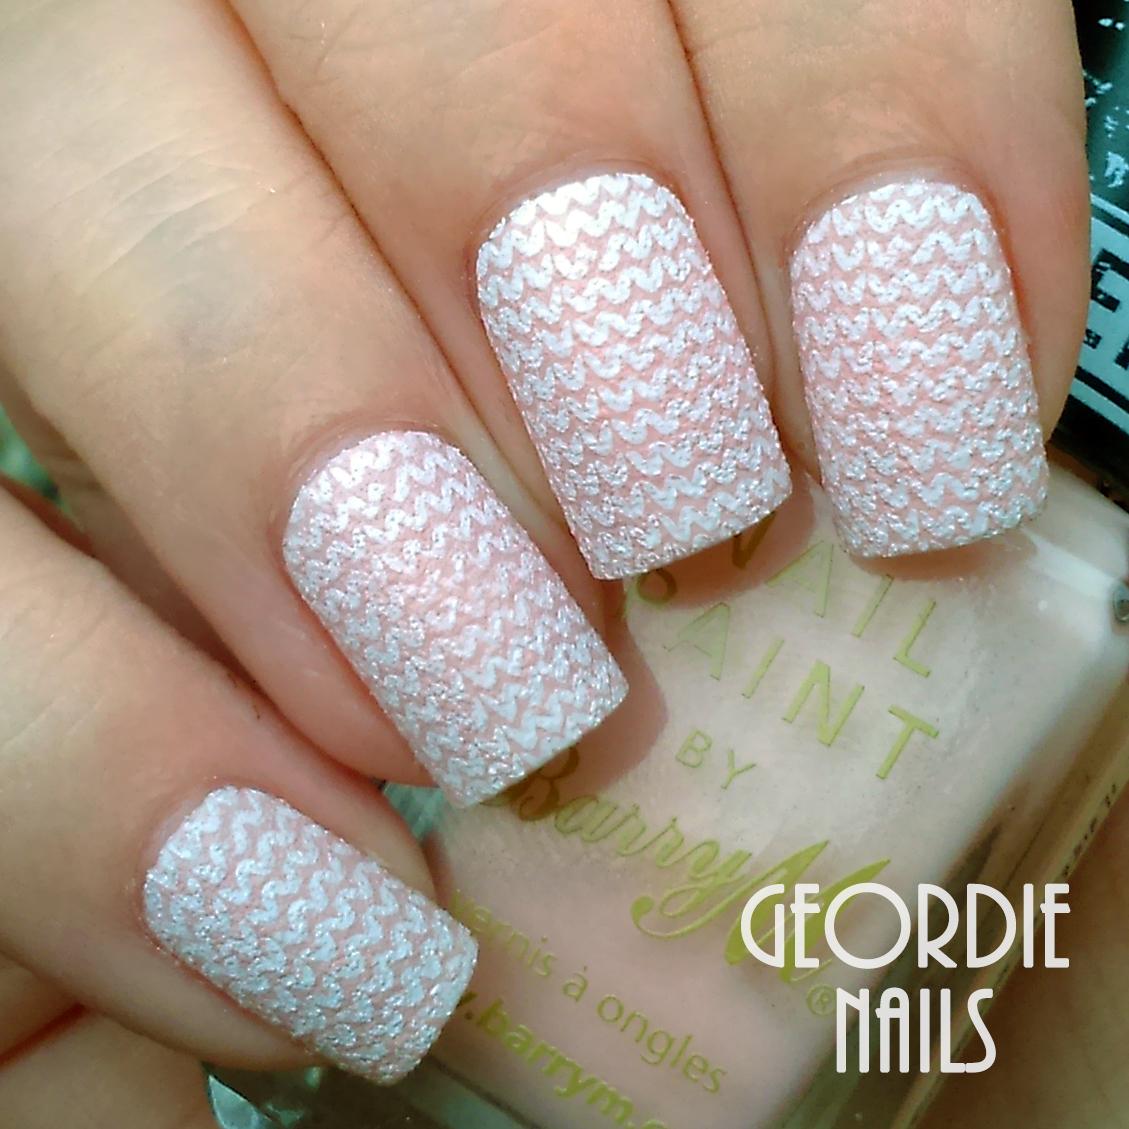 Geordie Nails: Two Fuzzy Knit Manicures!